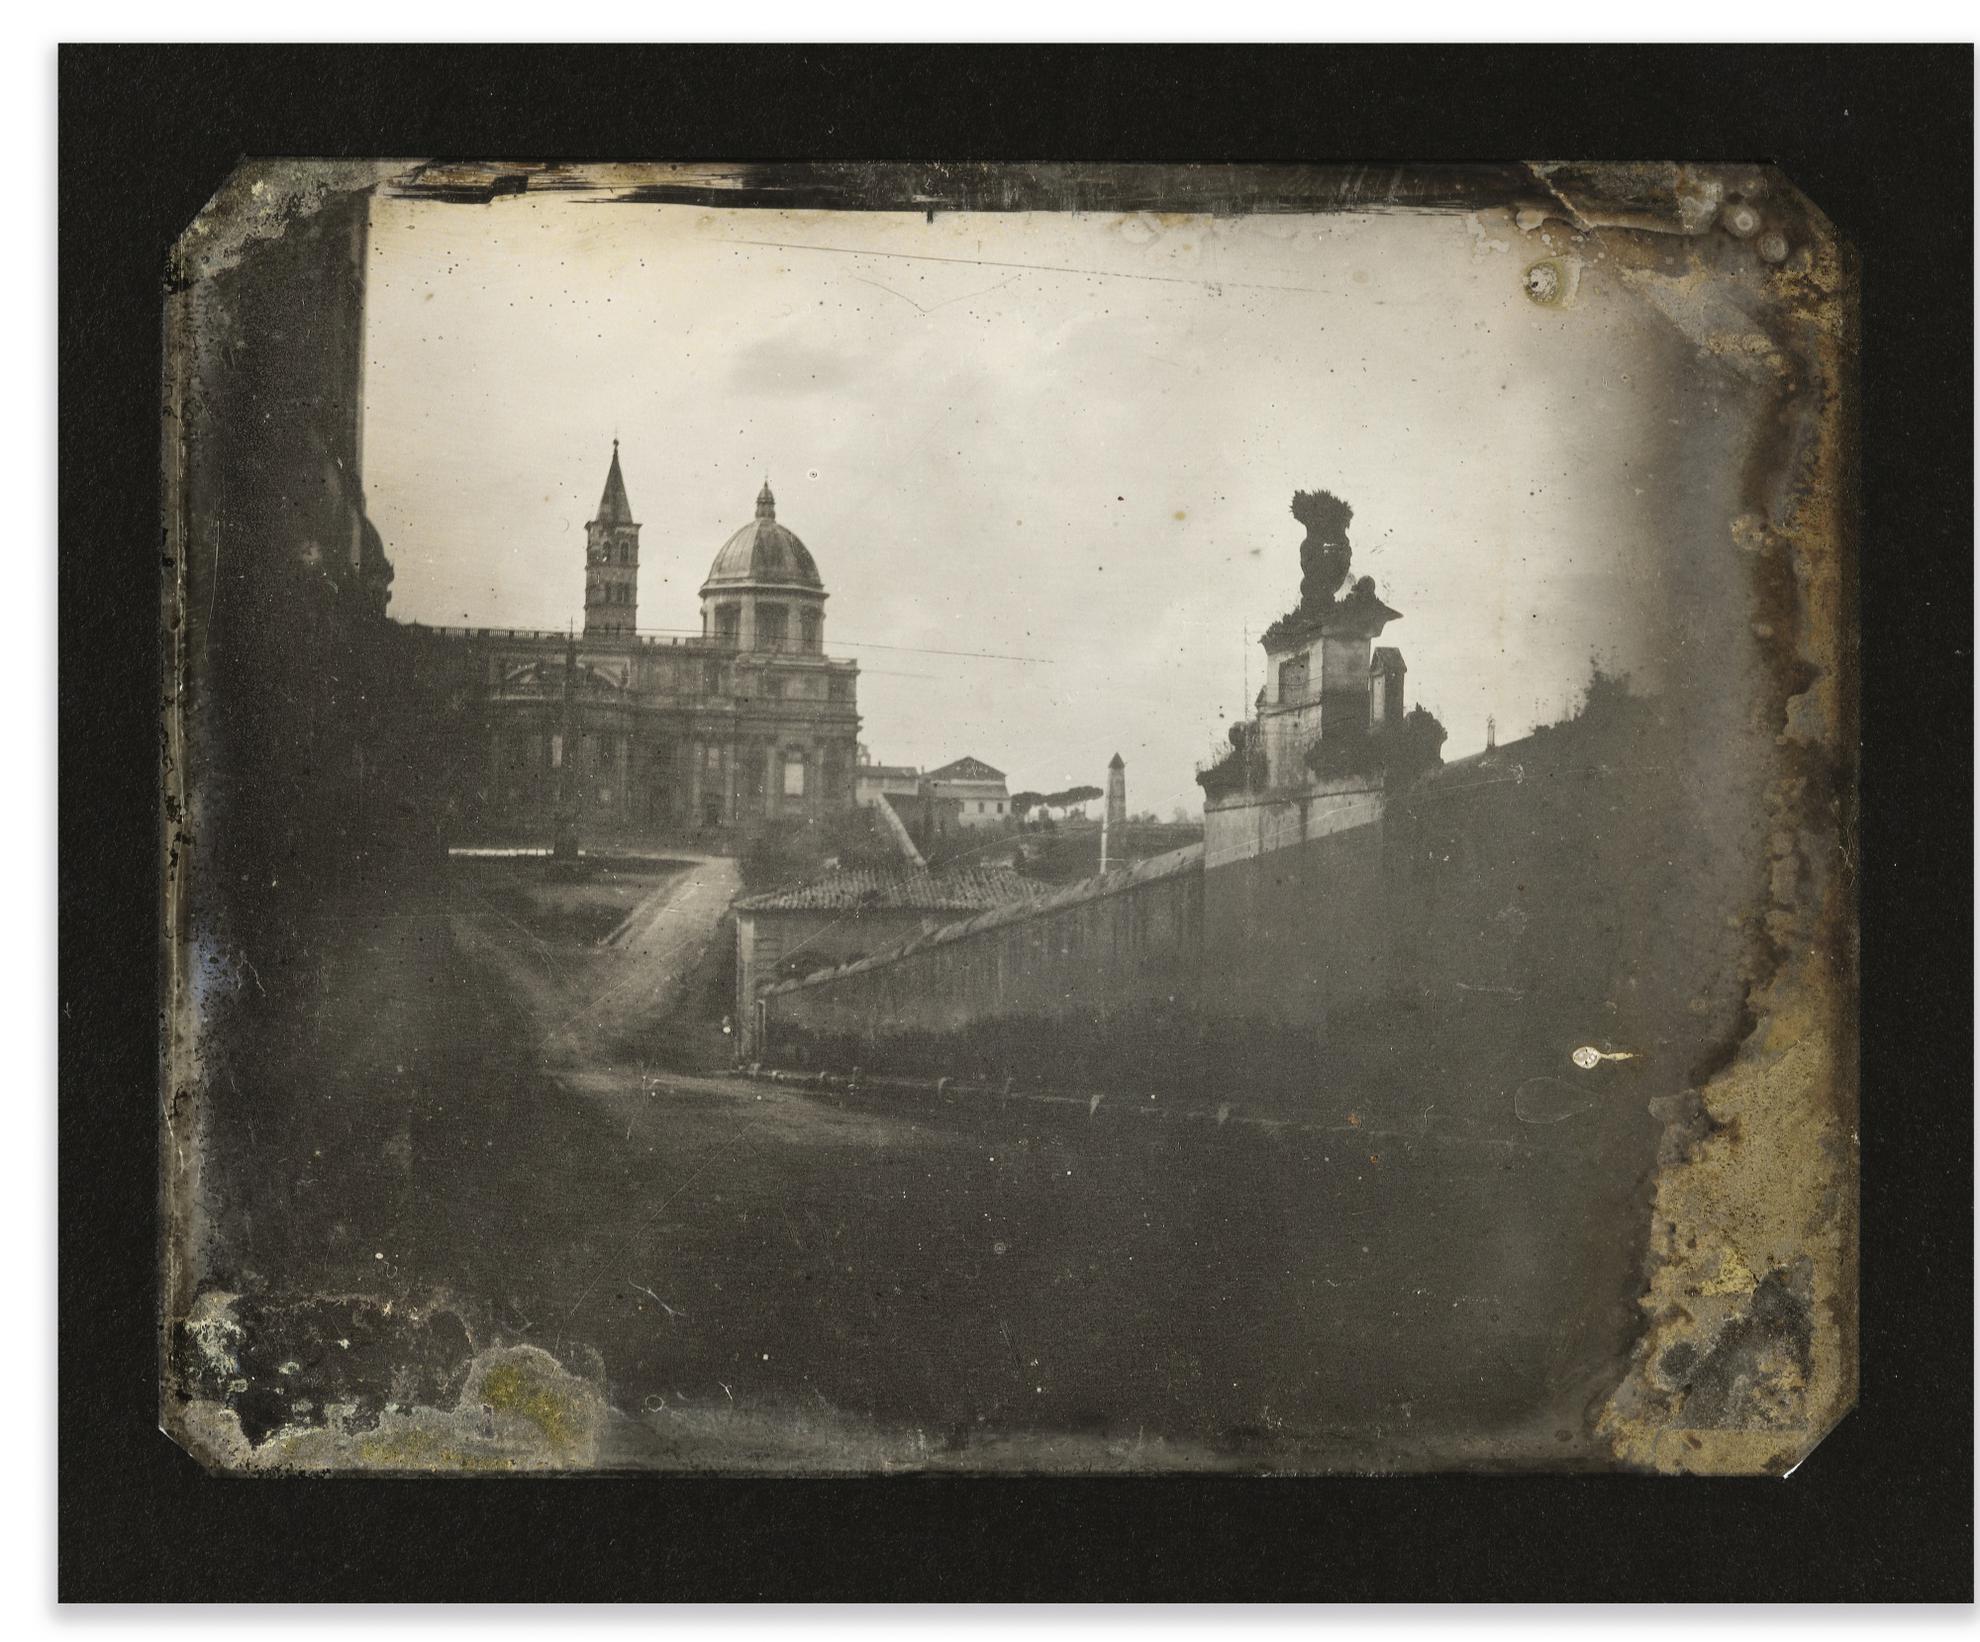 Joseph Philibert Girault De Prangey - 48. Rome, Santa Maria Maggiore-1842